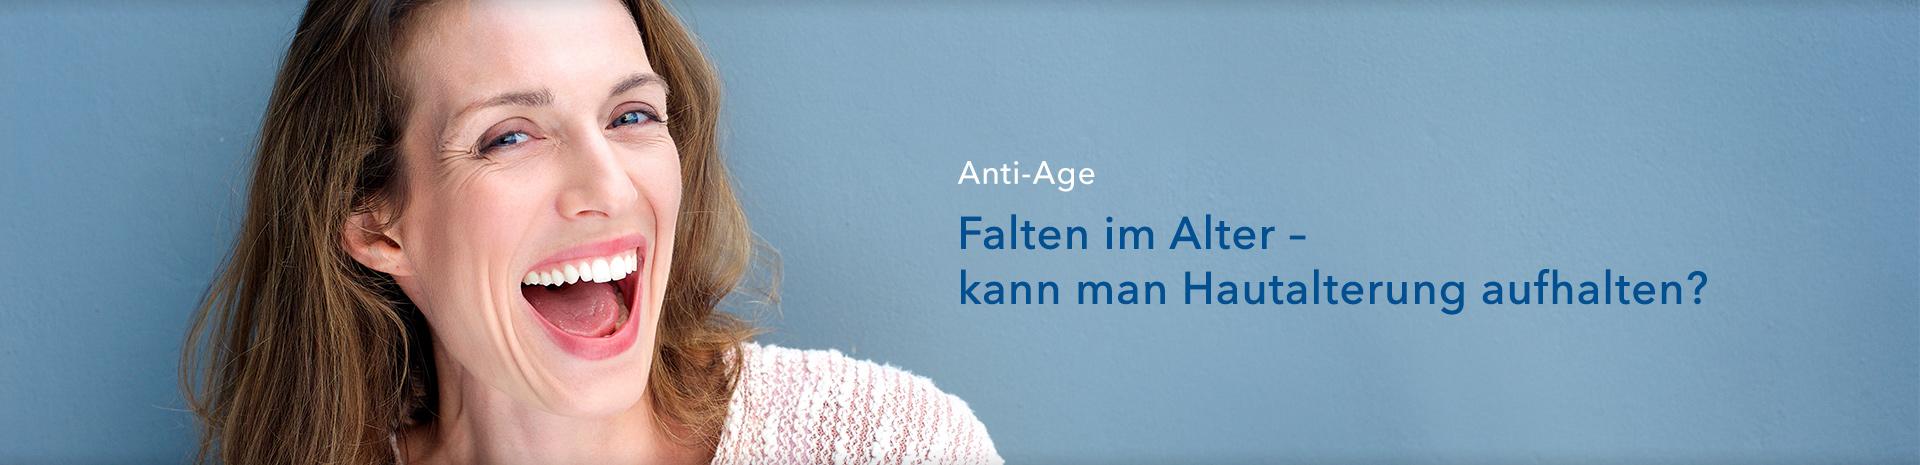 Anti-Age